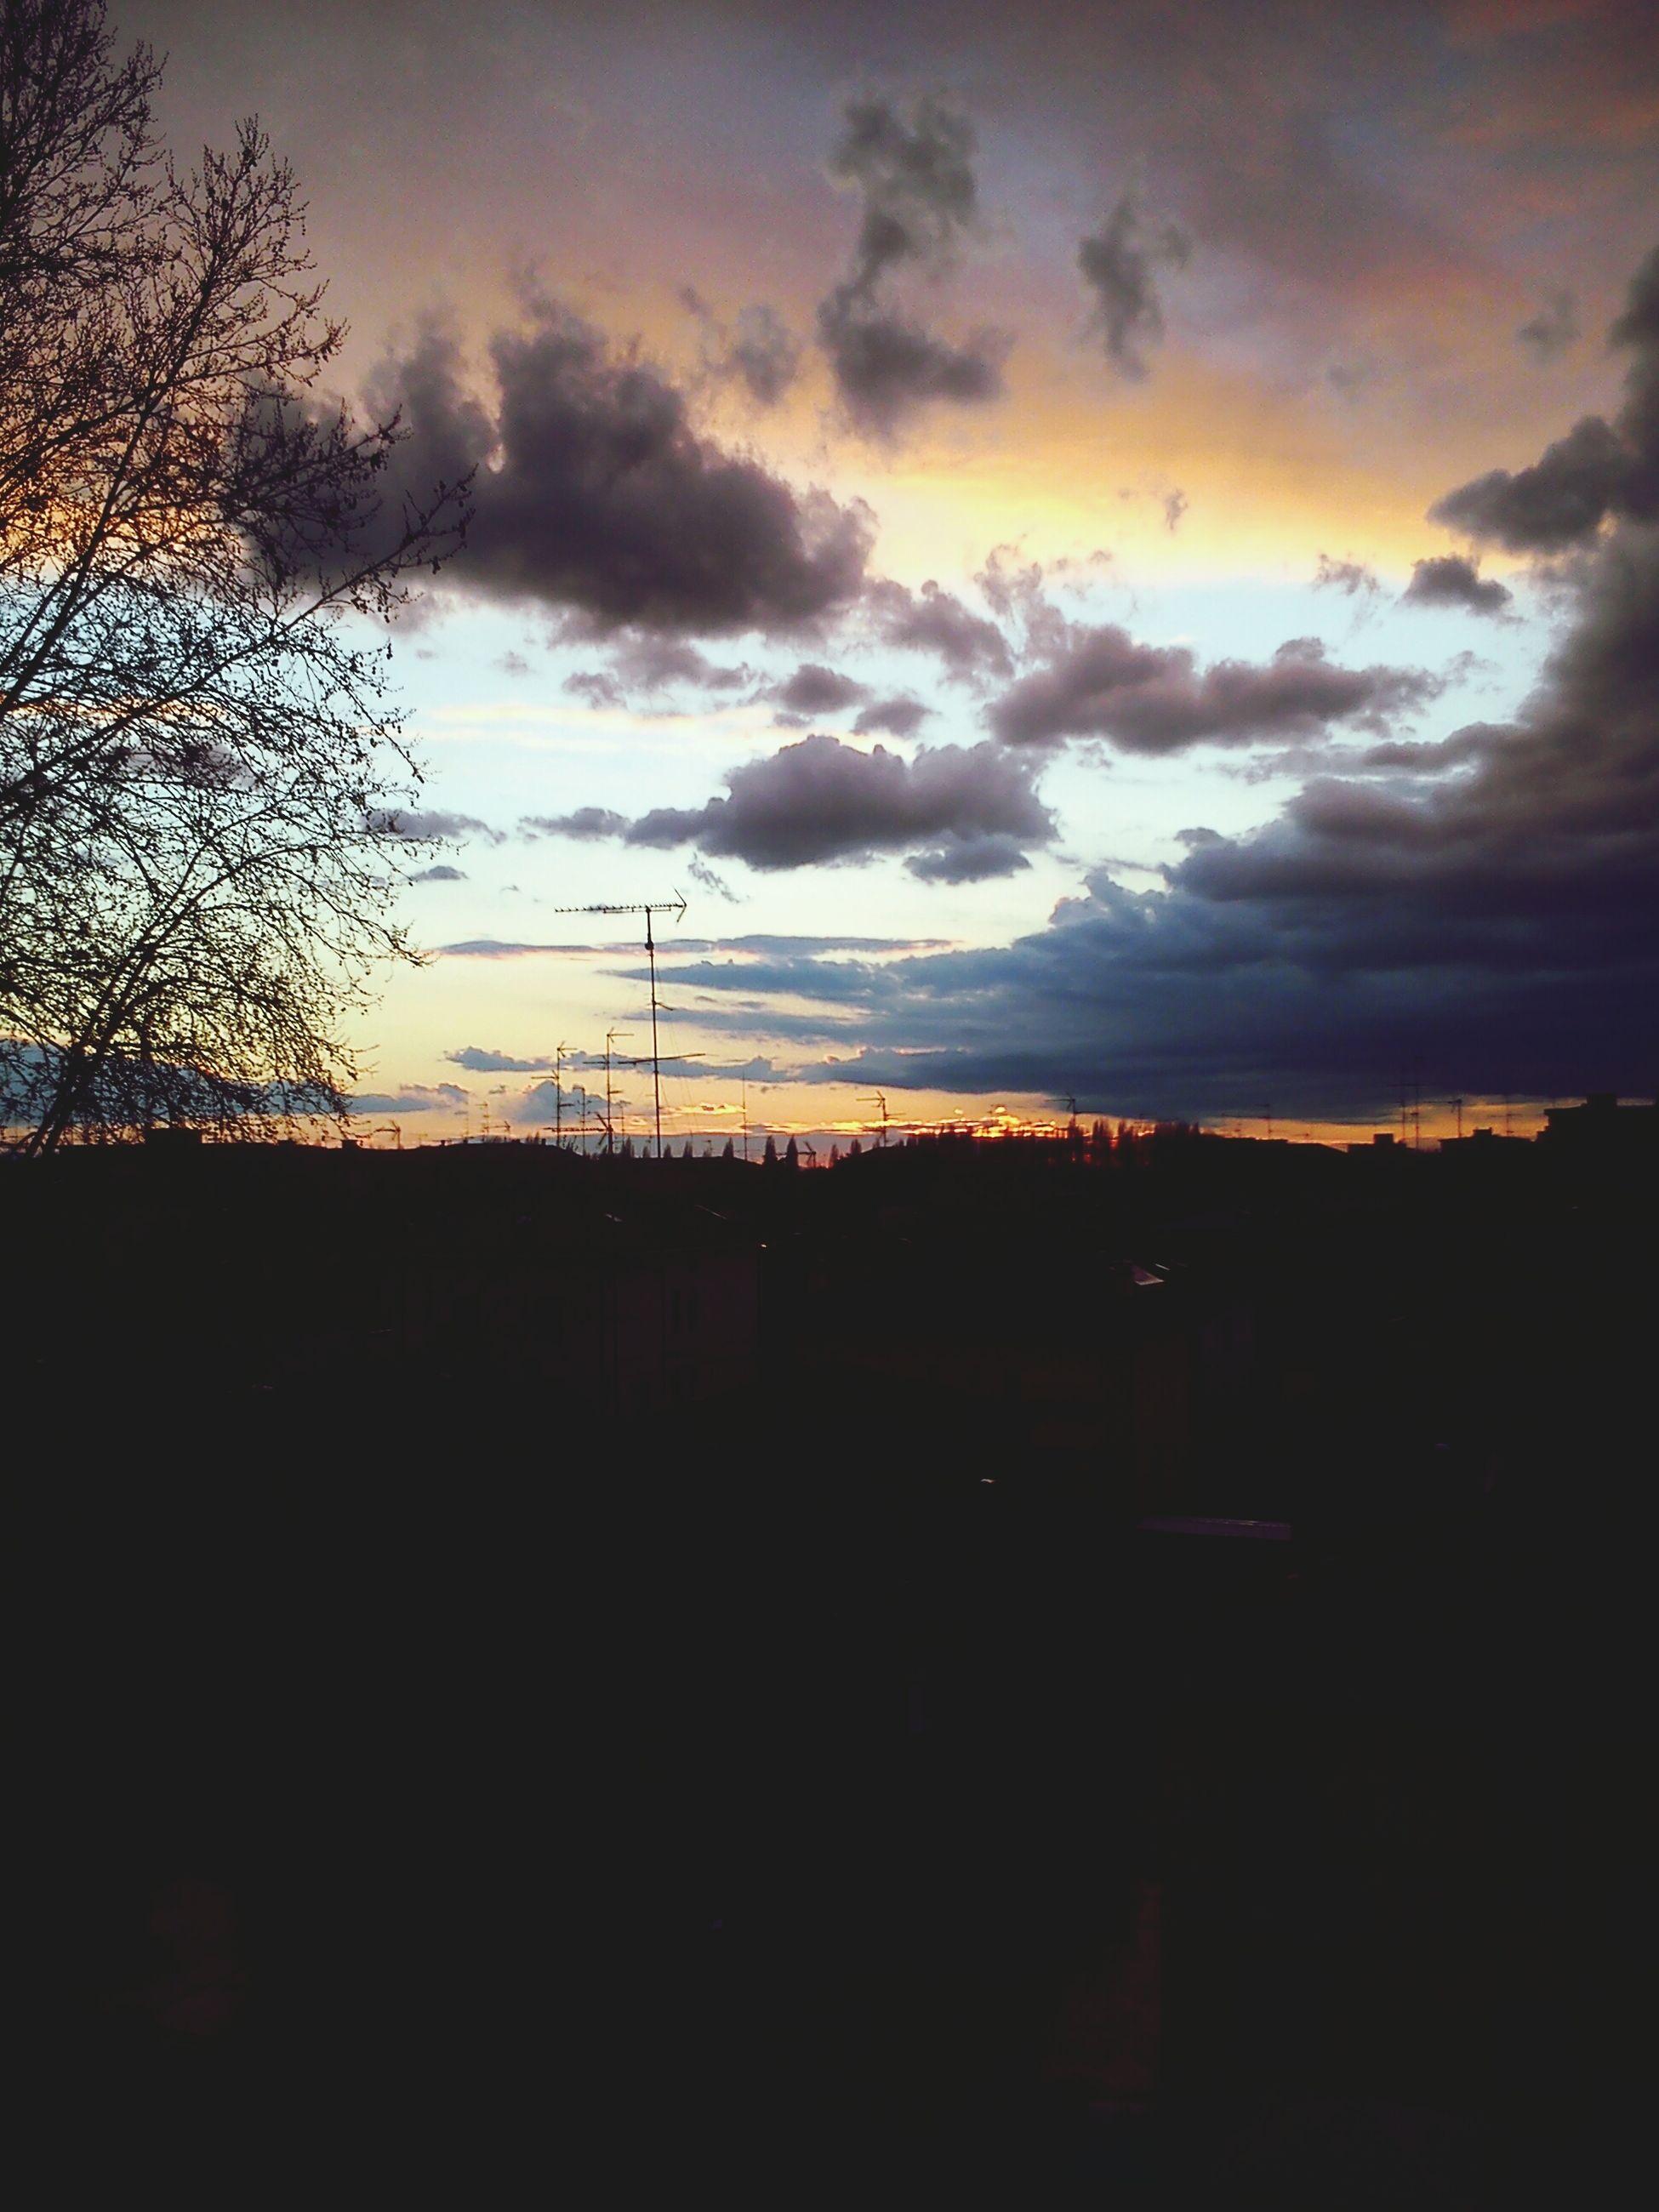 sunset, silhouette, sky, cloud - sky, orange color, scenics, beauty in nature, tranquility, tranquil scene, tree, landscape, nature, cloud, built structure, dark, cloudy, electricity pylon, idyllic, dusk, building exterior